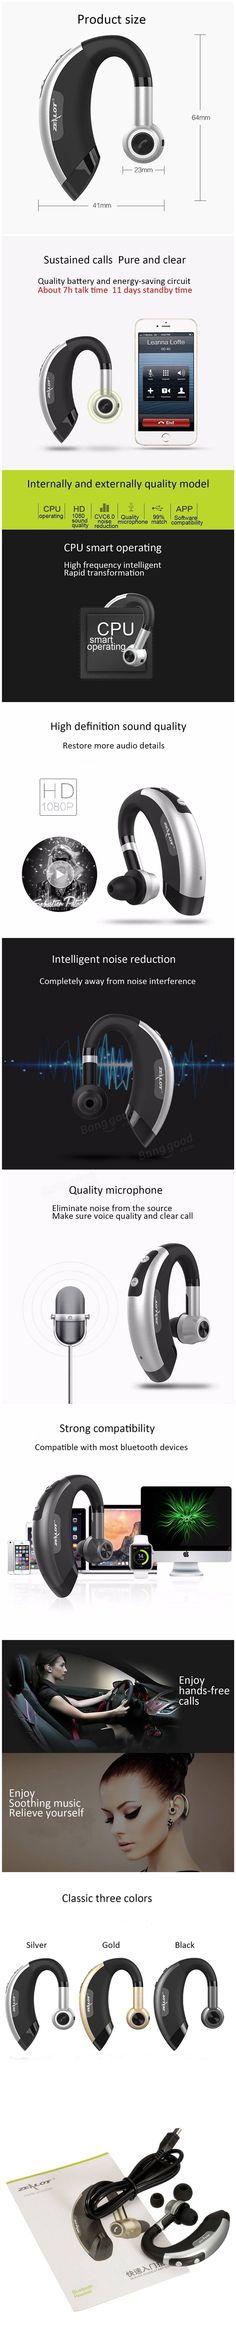 ZEALOT E1 Wireless Bluetooth 4.0 Headset Headphone Earphone With Mic For iPhone HTC